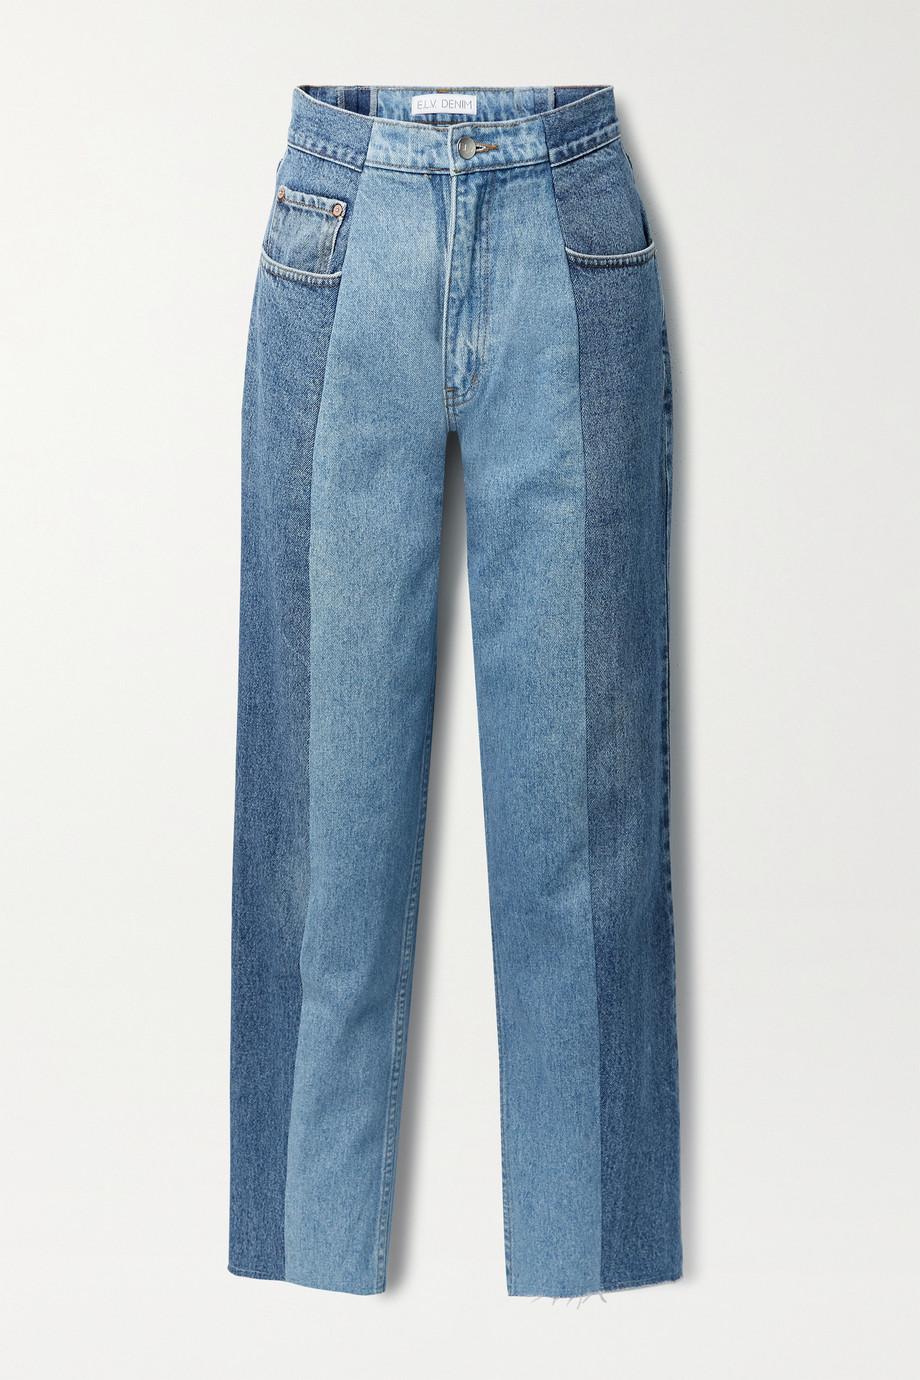 E.L.V. Denim + NET SUSTAIN The Twin frayed two-tone boyfriend jeans